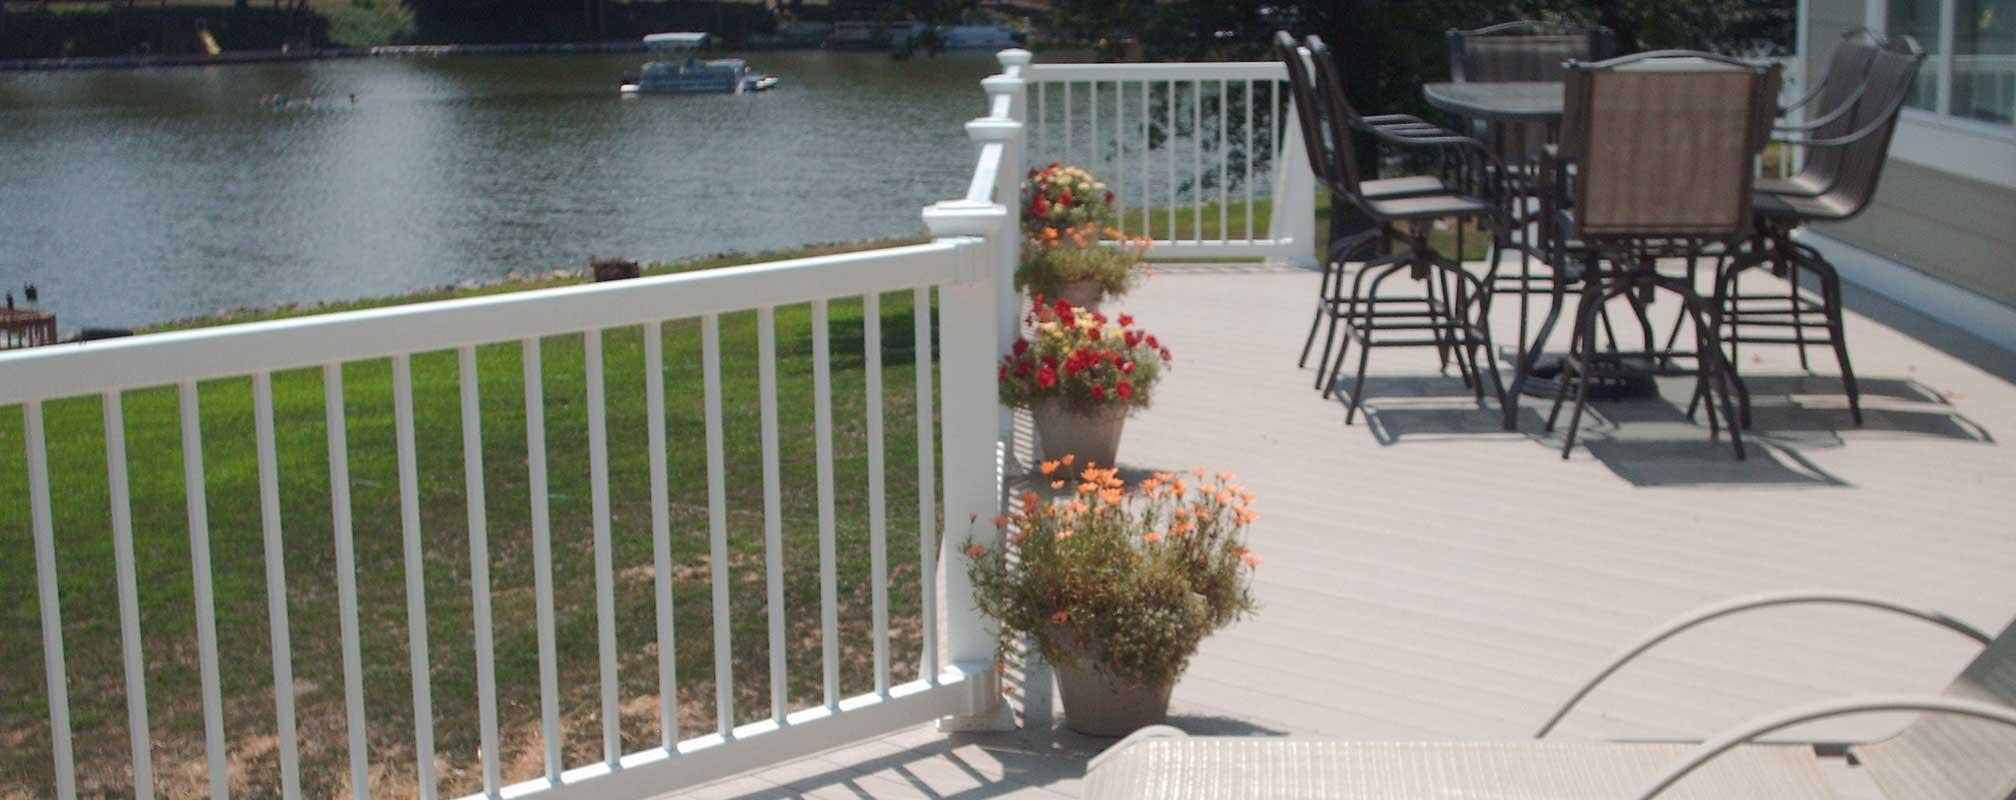 picket railing